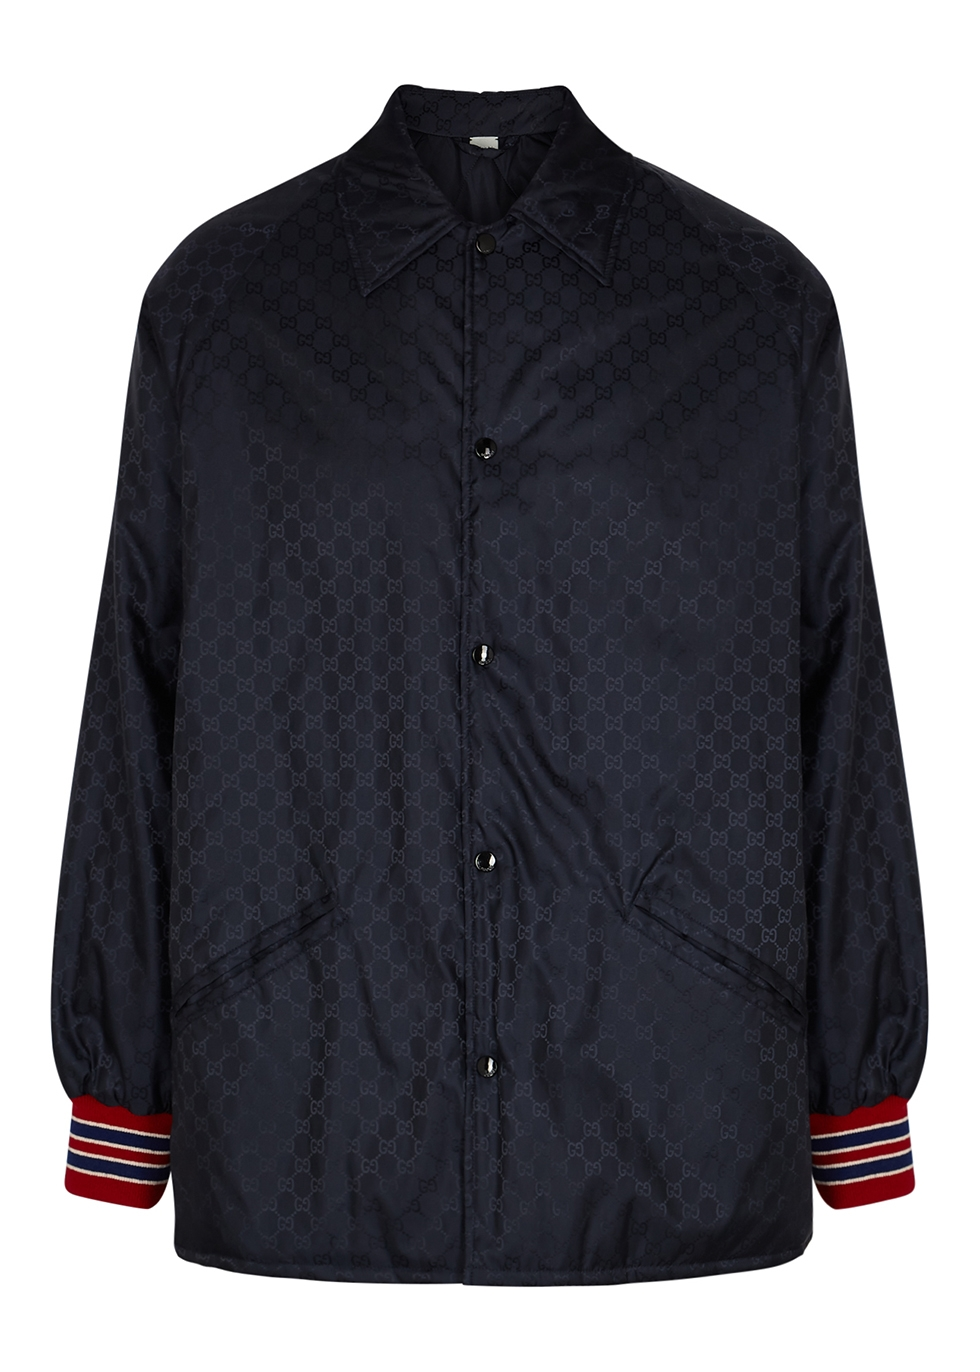 Navy GG-jacquard shell jacket